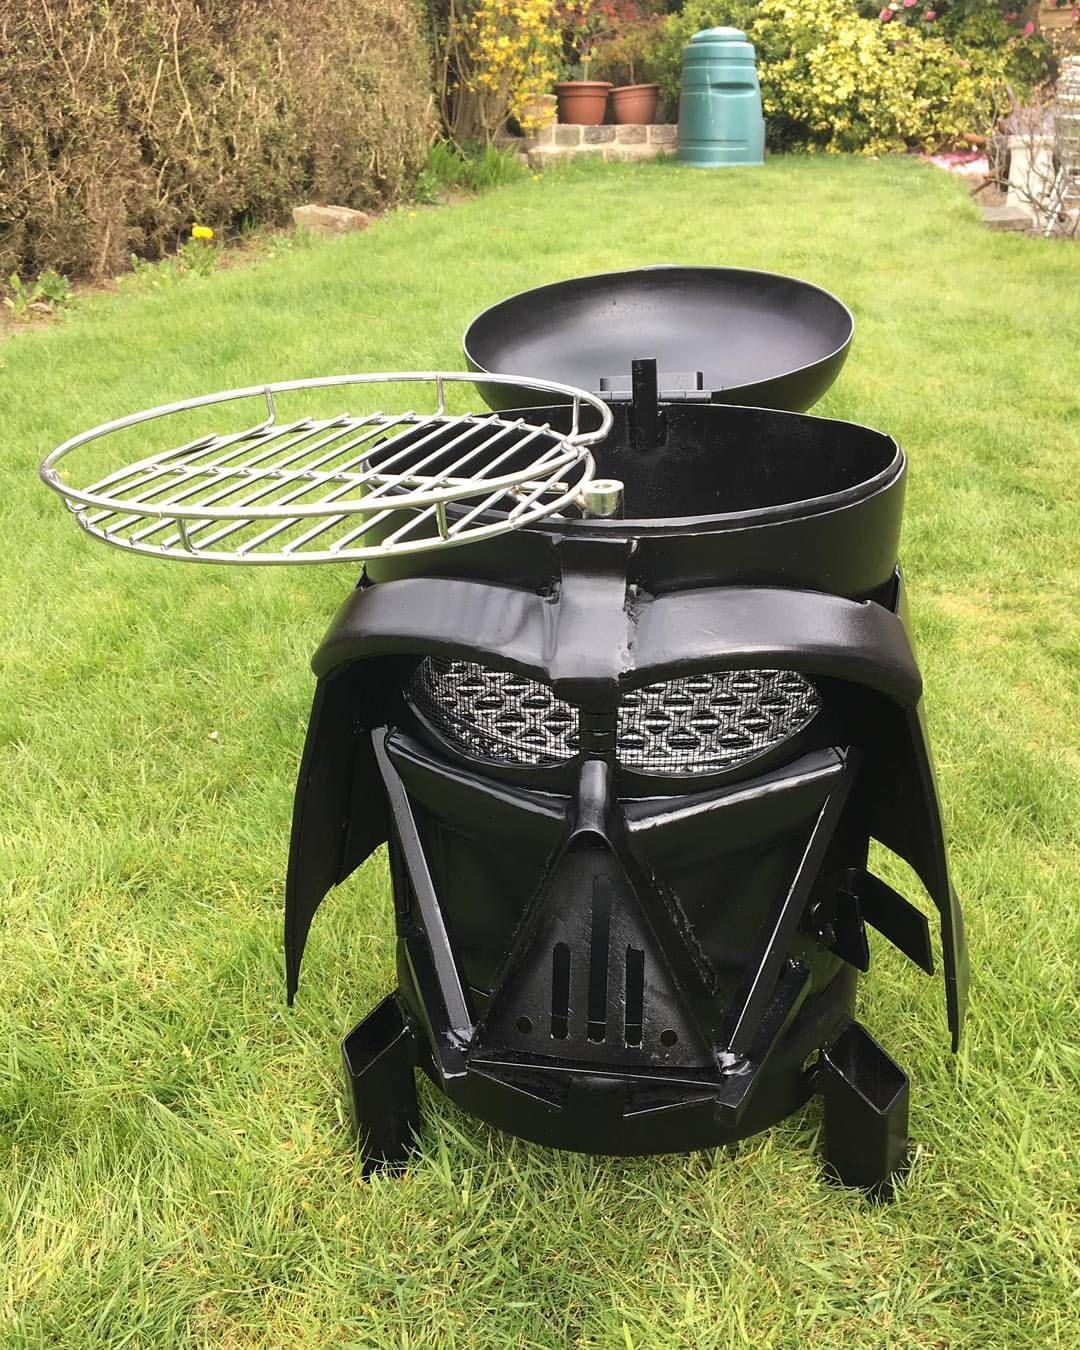 Star Wars Darth Vader Inspired Grill Shut Amp Take My